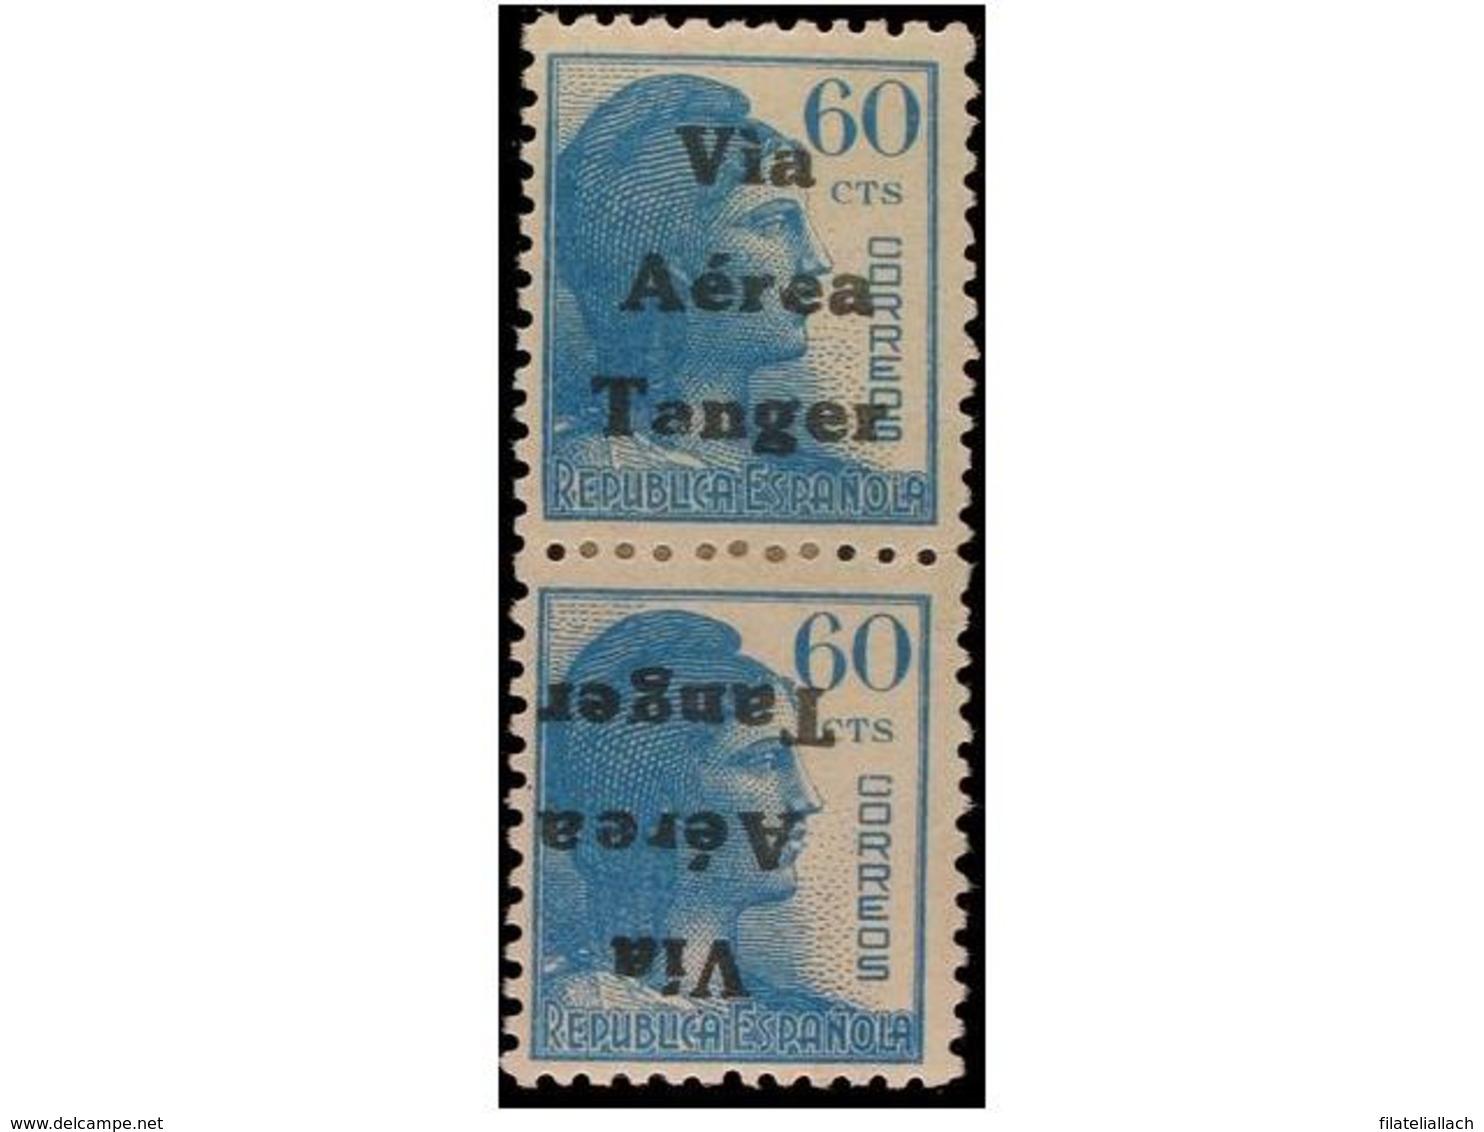 TANGER: SPANISH DOMINION - Spanish Morocco